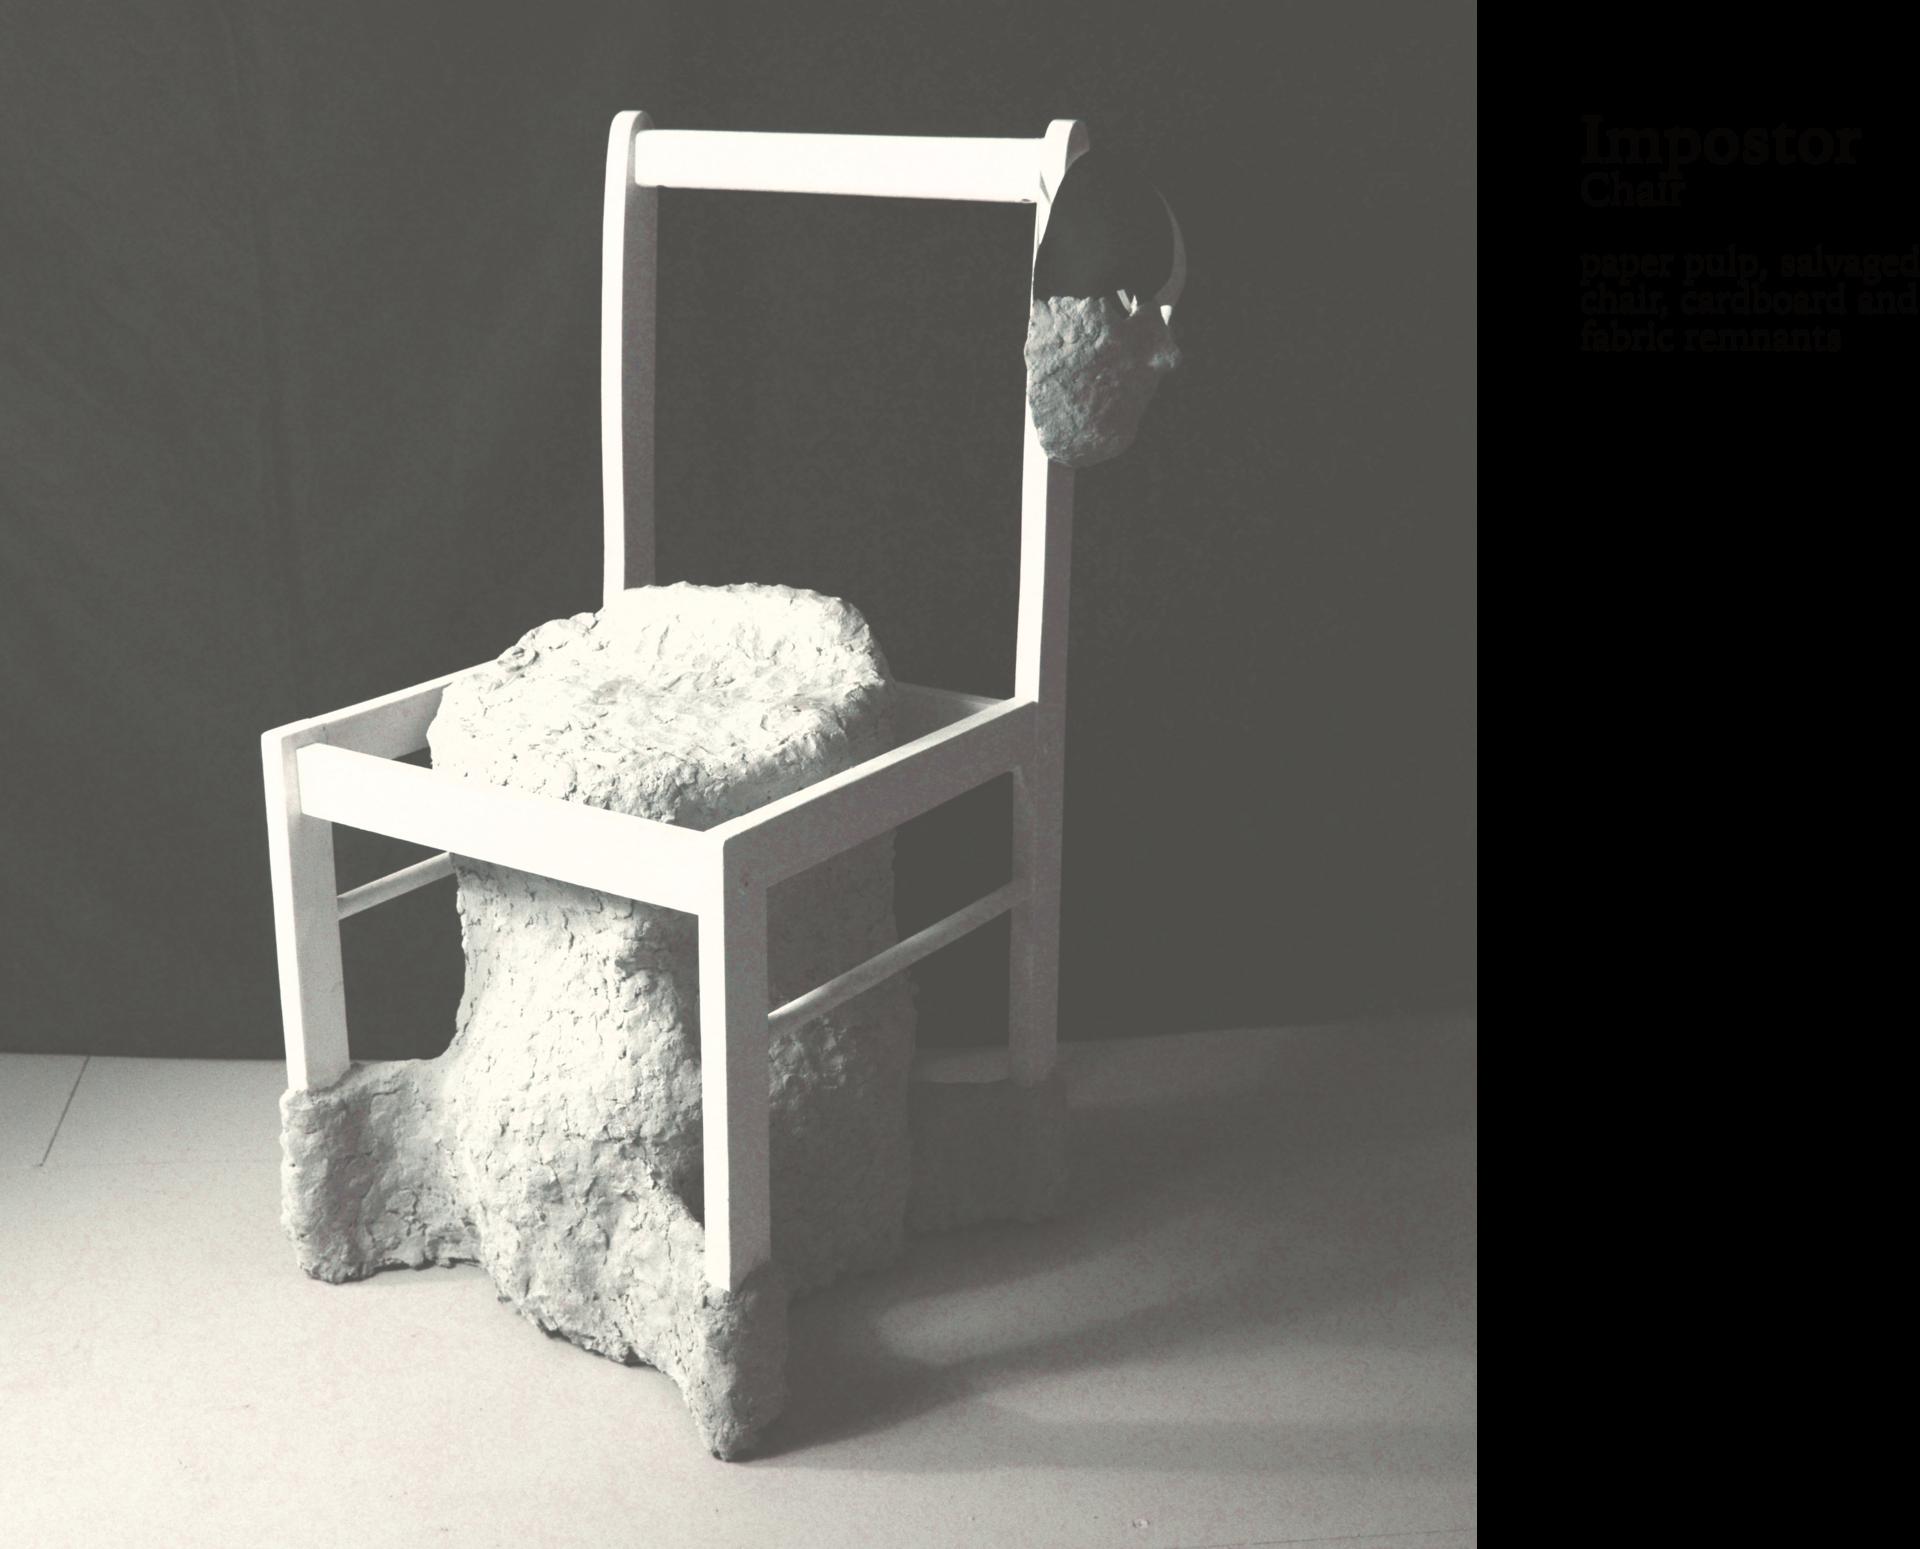 Impostor Chair